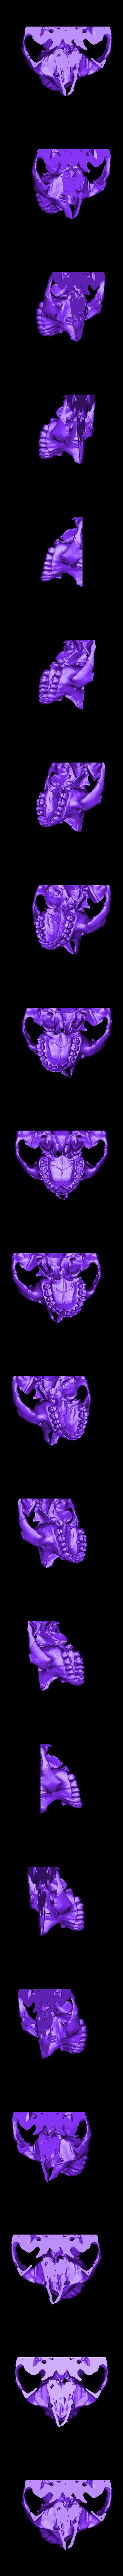 skull-bottom-front.stl Download free STL file Human skull, anatomically correct - for smaller printers • 3D printer template, firebird